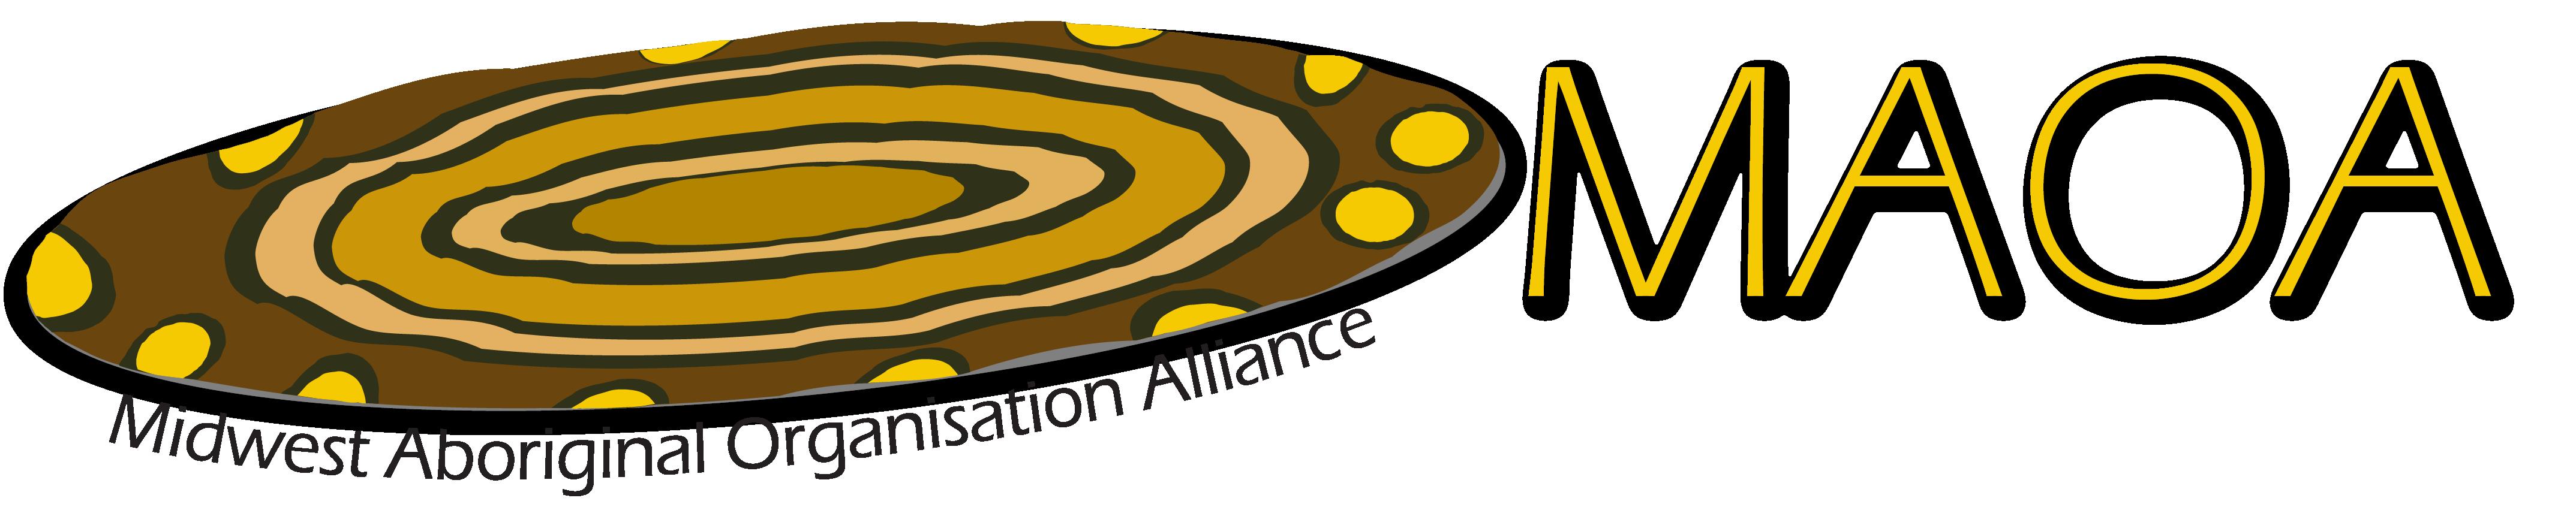 Warrior clipart aboriginal. Midwest organisation alliance toggle